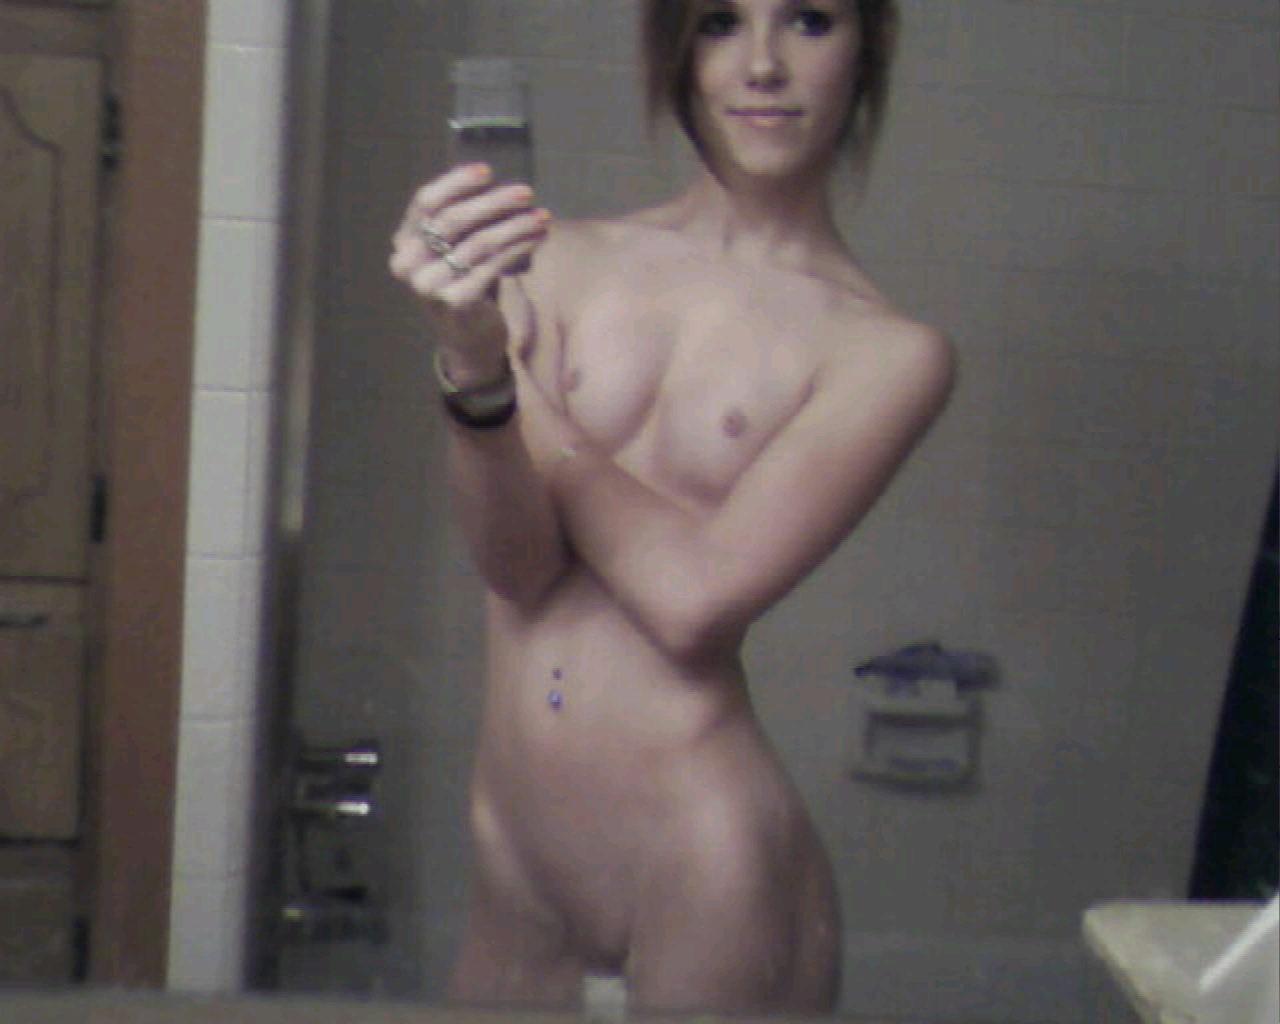 lady fyre femdom sex ed with religious mom lady fyre #amateur #fullfrontalnude #hotgirl #landingstrip #naked #selfshot #slender #teen #tightpussy